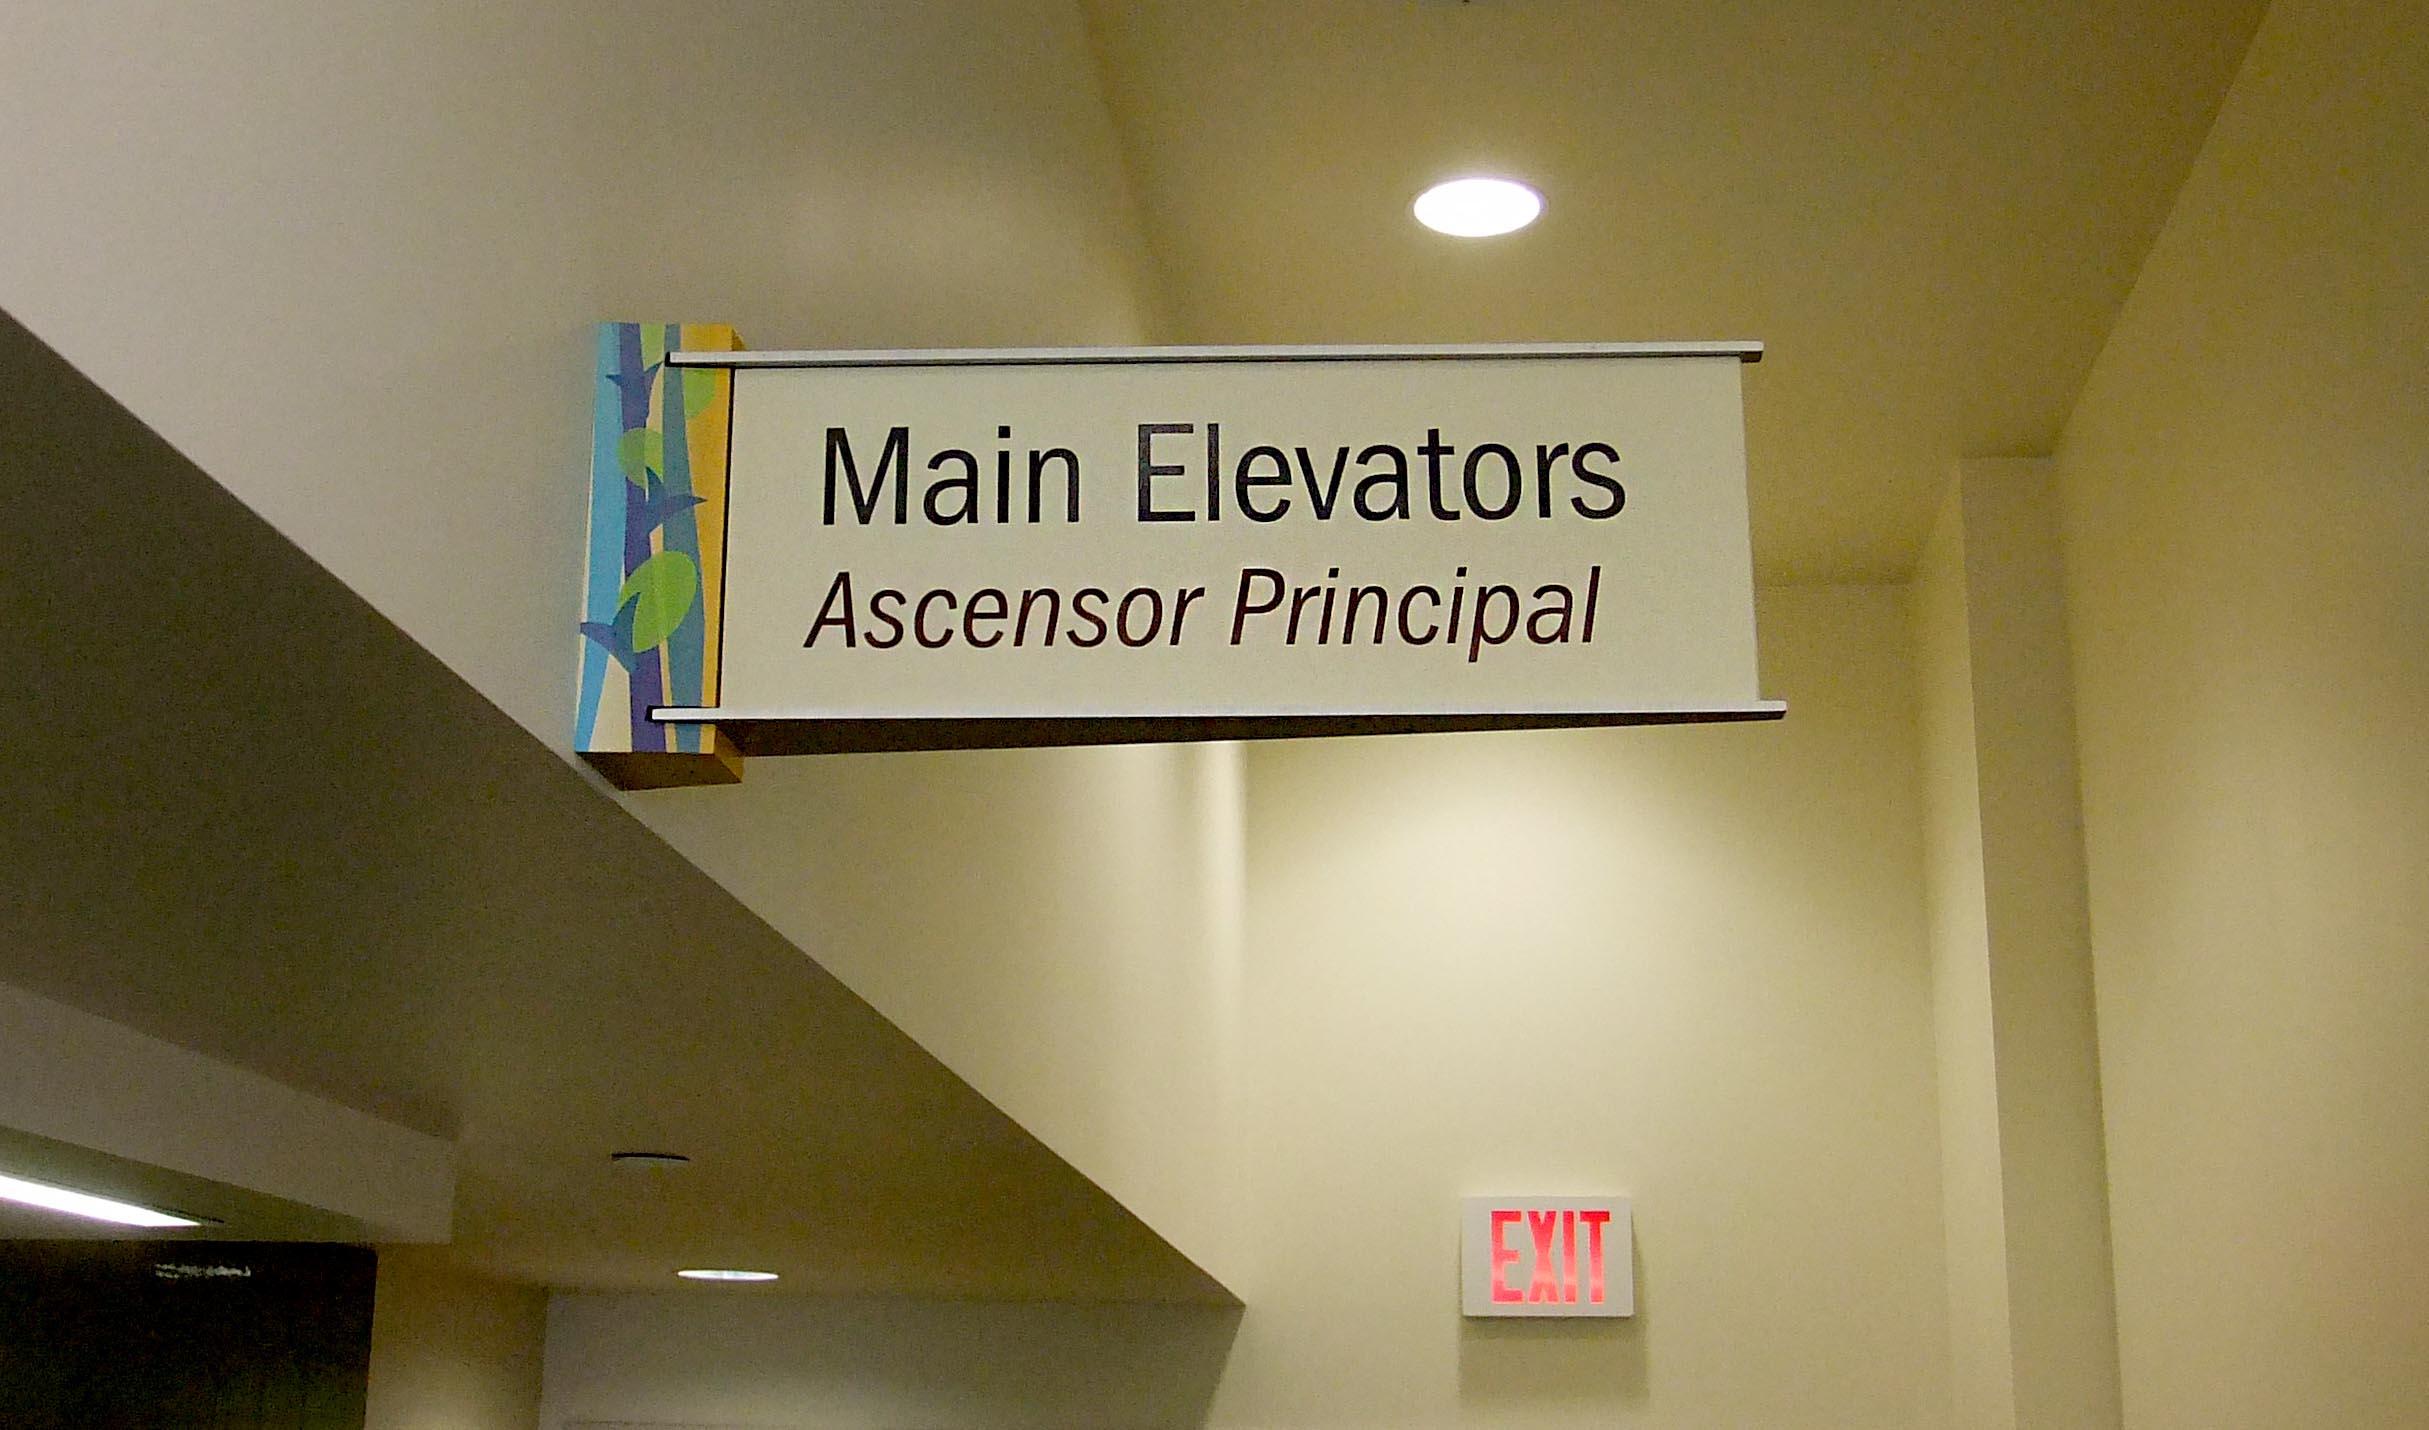 Elevator Hospital Signs.jpg